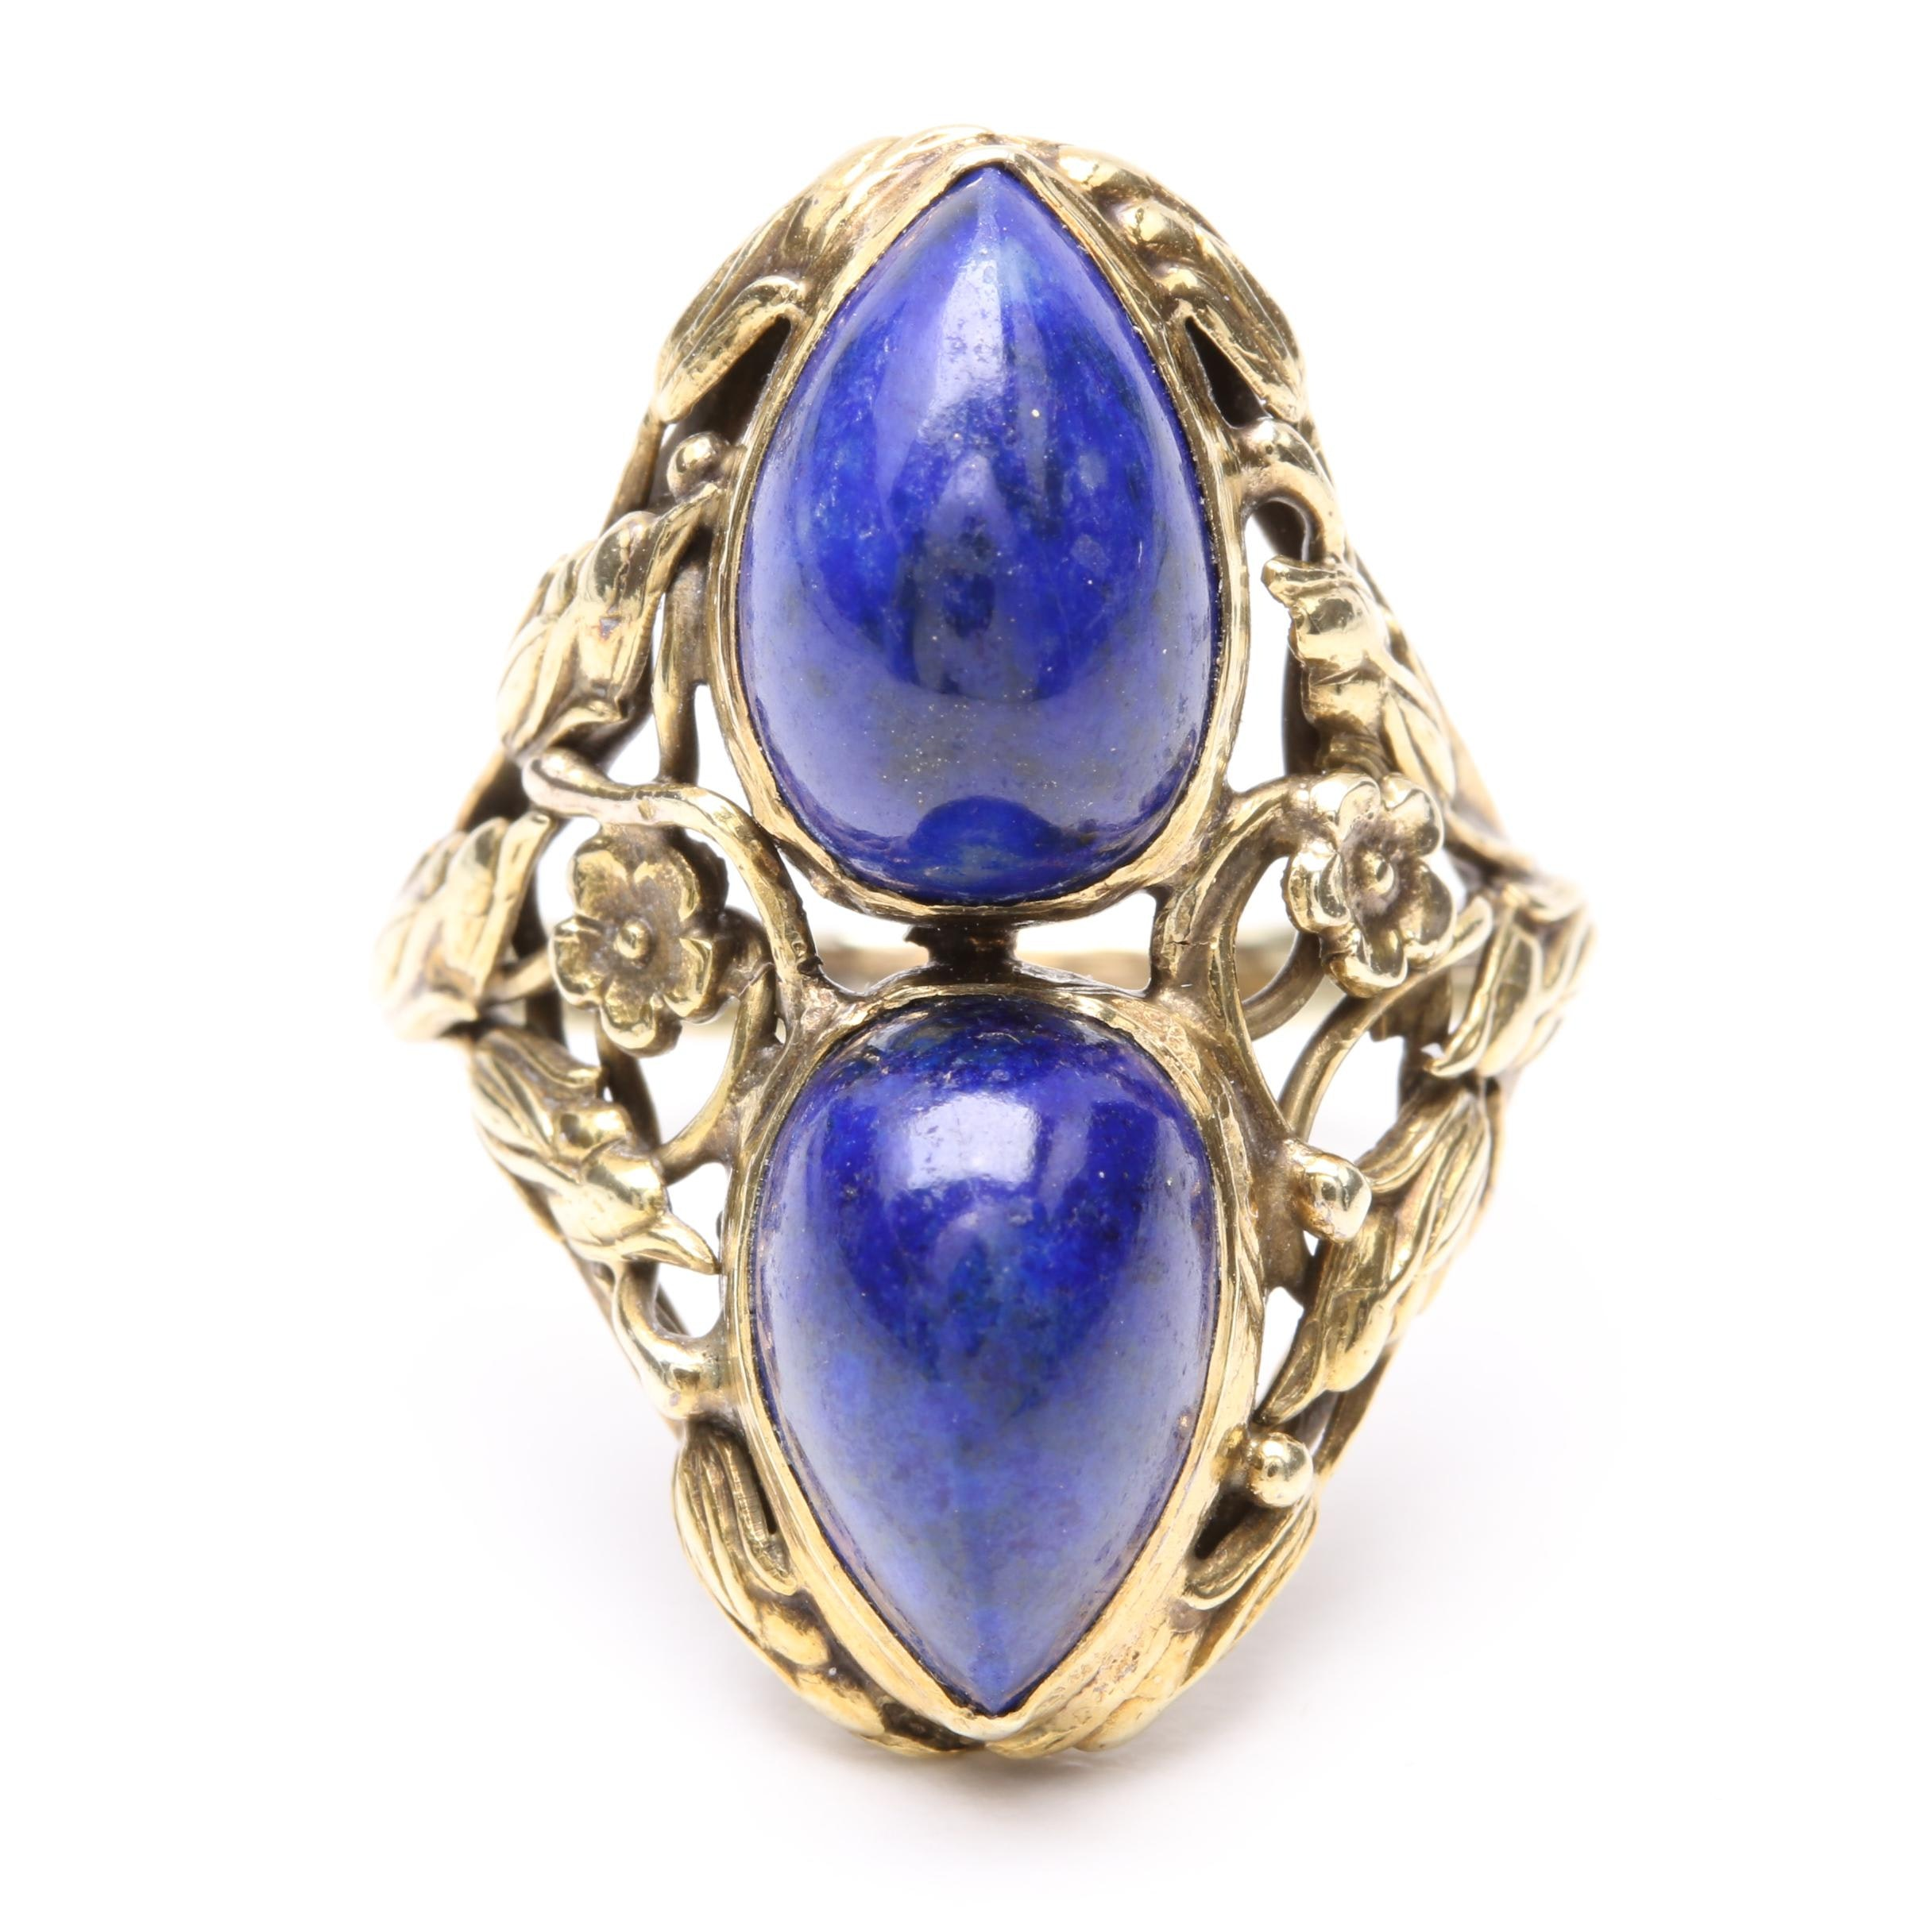 Art Nouveau 14K Yellow Gold Lapis Lazuli Ring